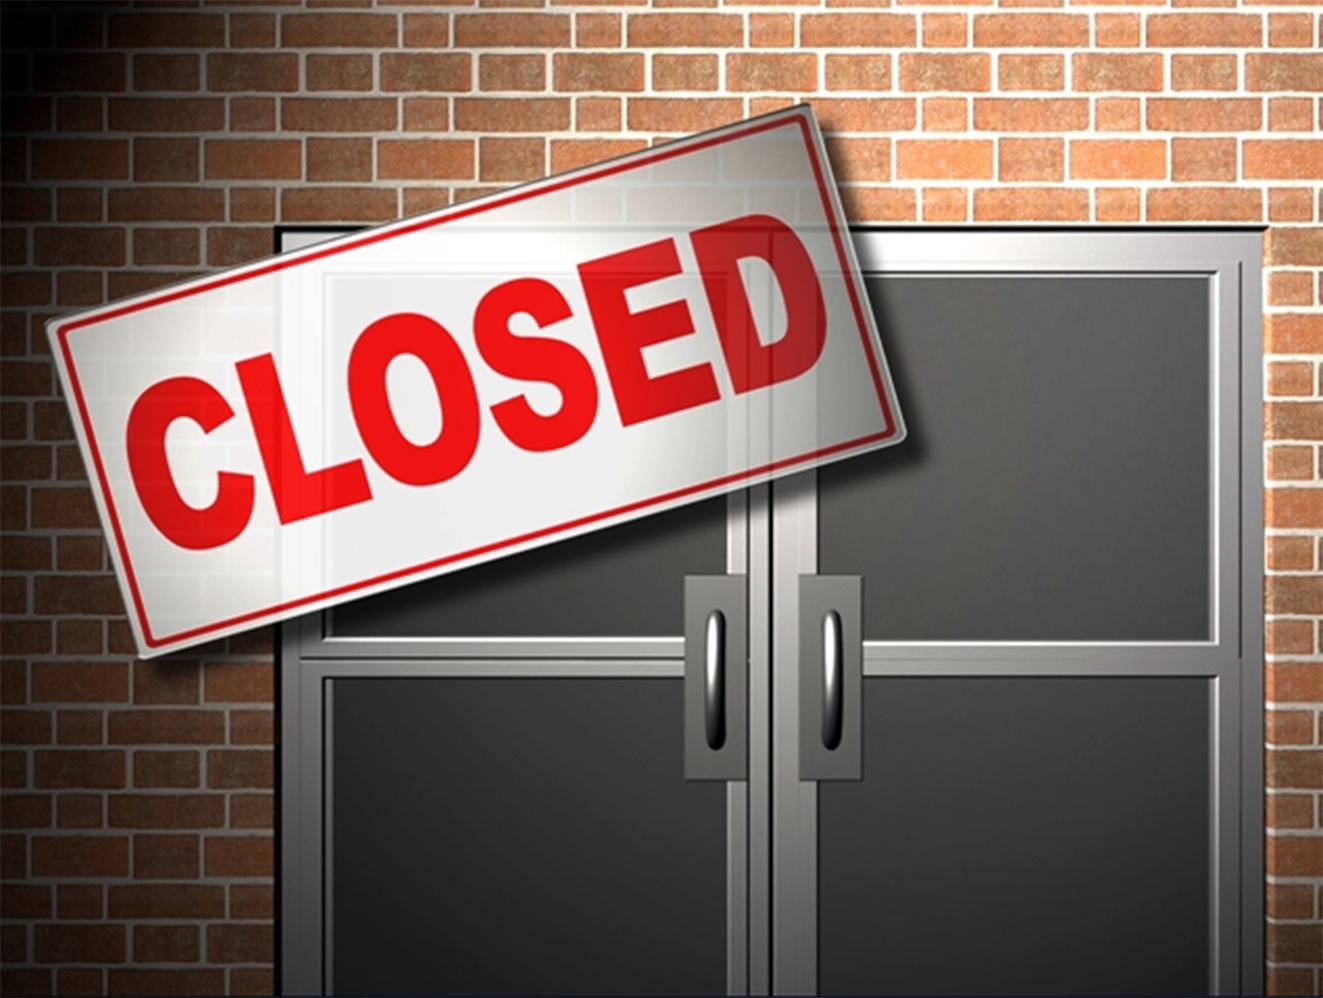 closed sign_1556819704791.jpg.jpg